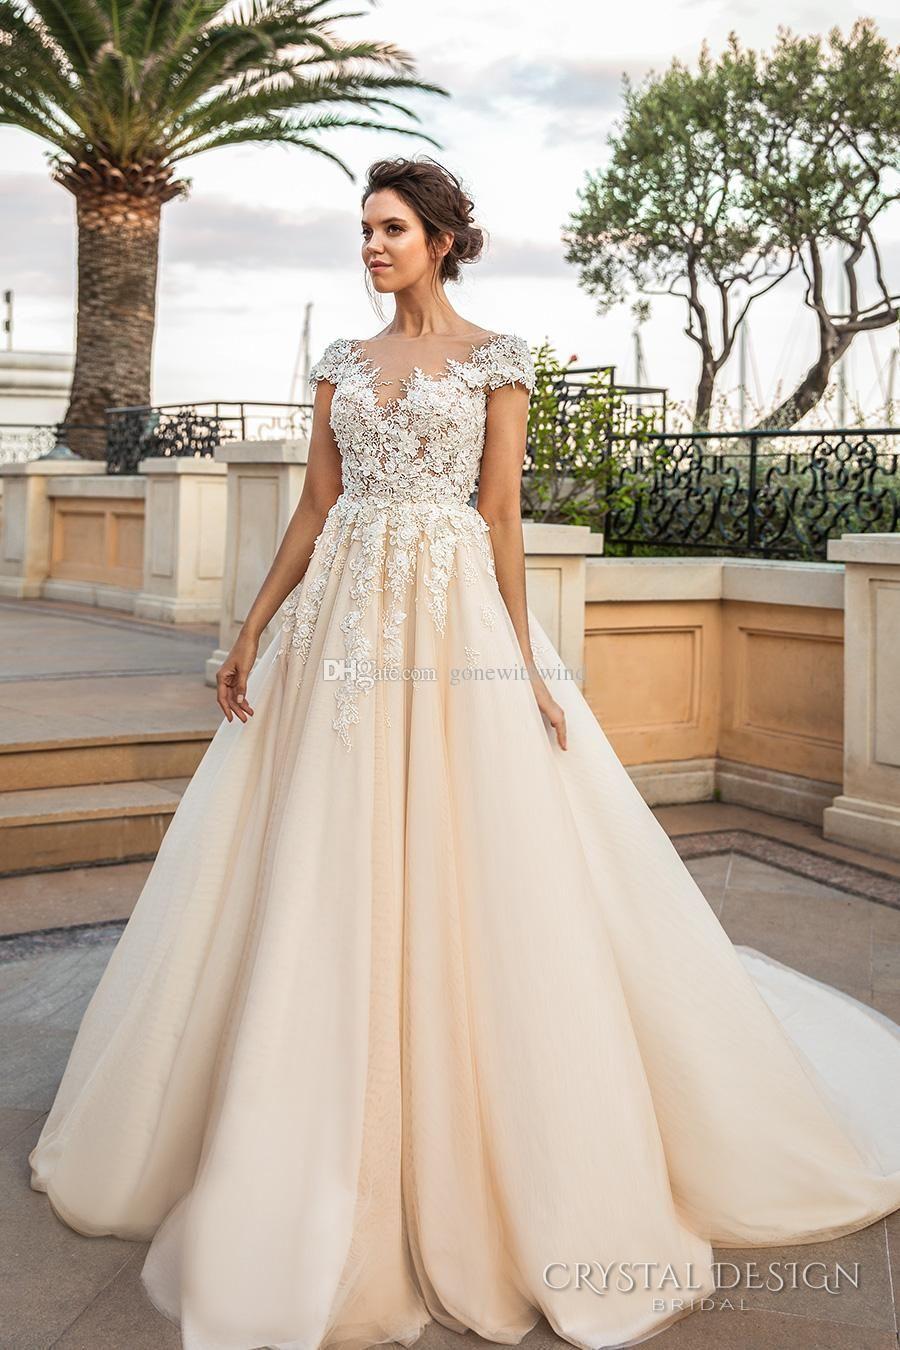 Sheer long sleeve wedding dresses  Romantic princess ivory cream wedding dresses  crystal design